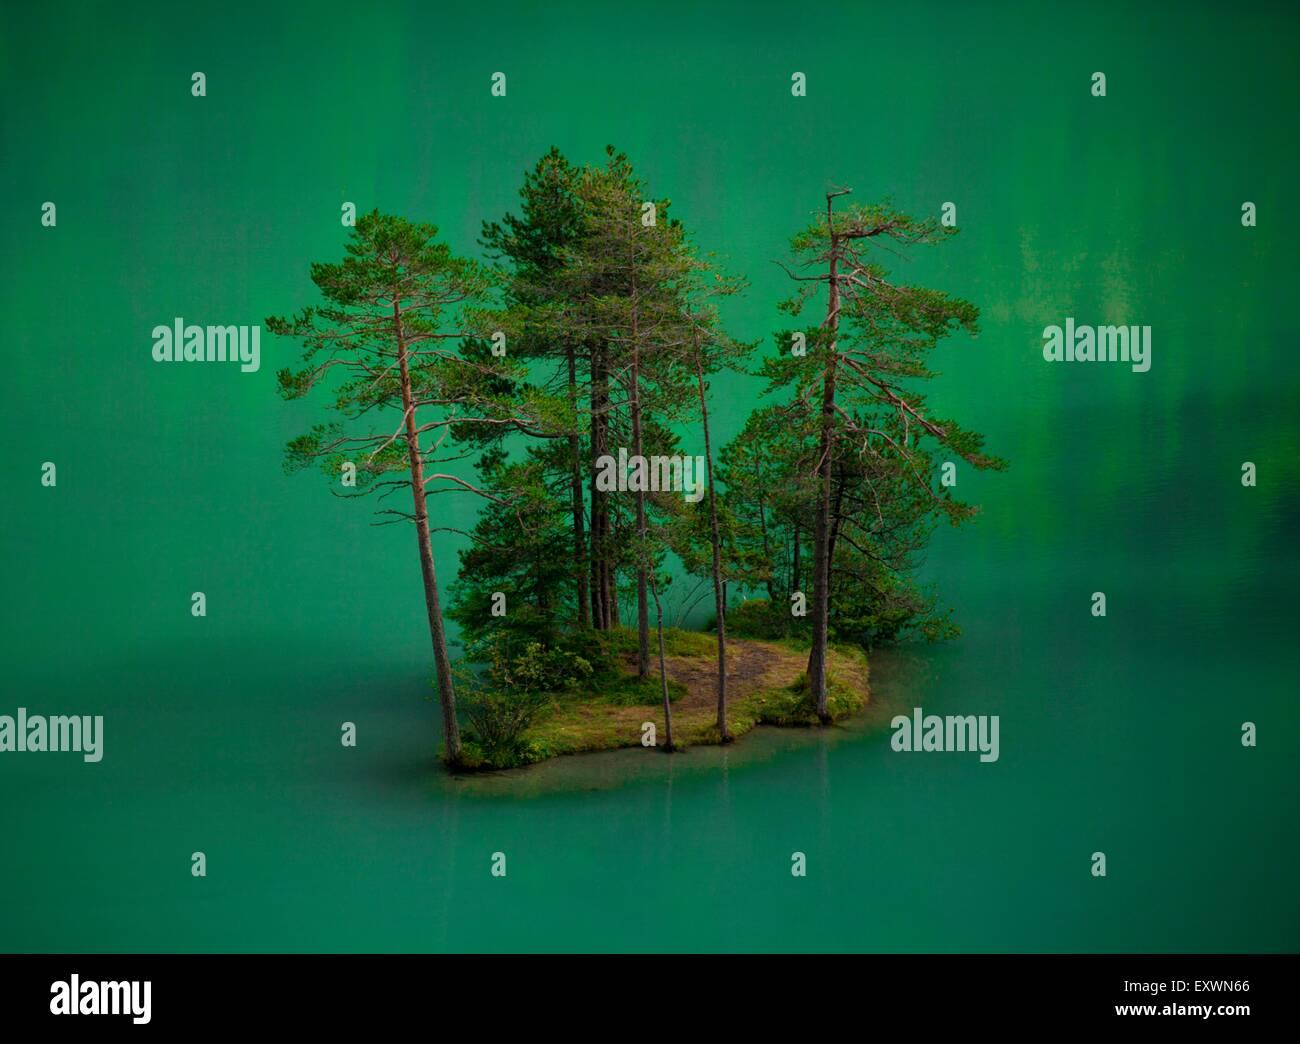 Pine trees in Fernsteinsee, Nassereith, Tyrol, Austria - Stock Image